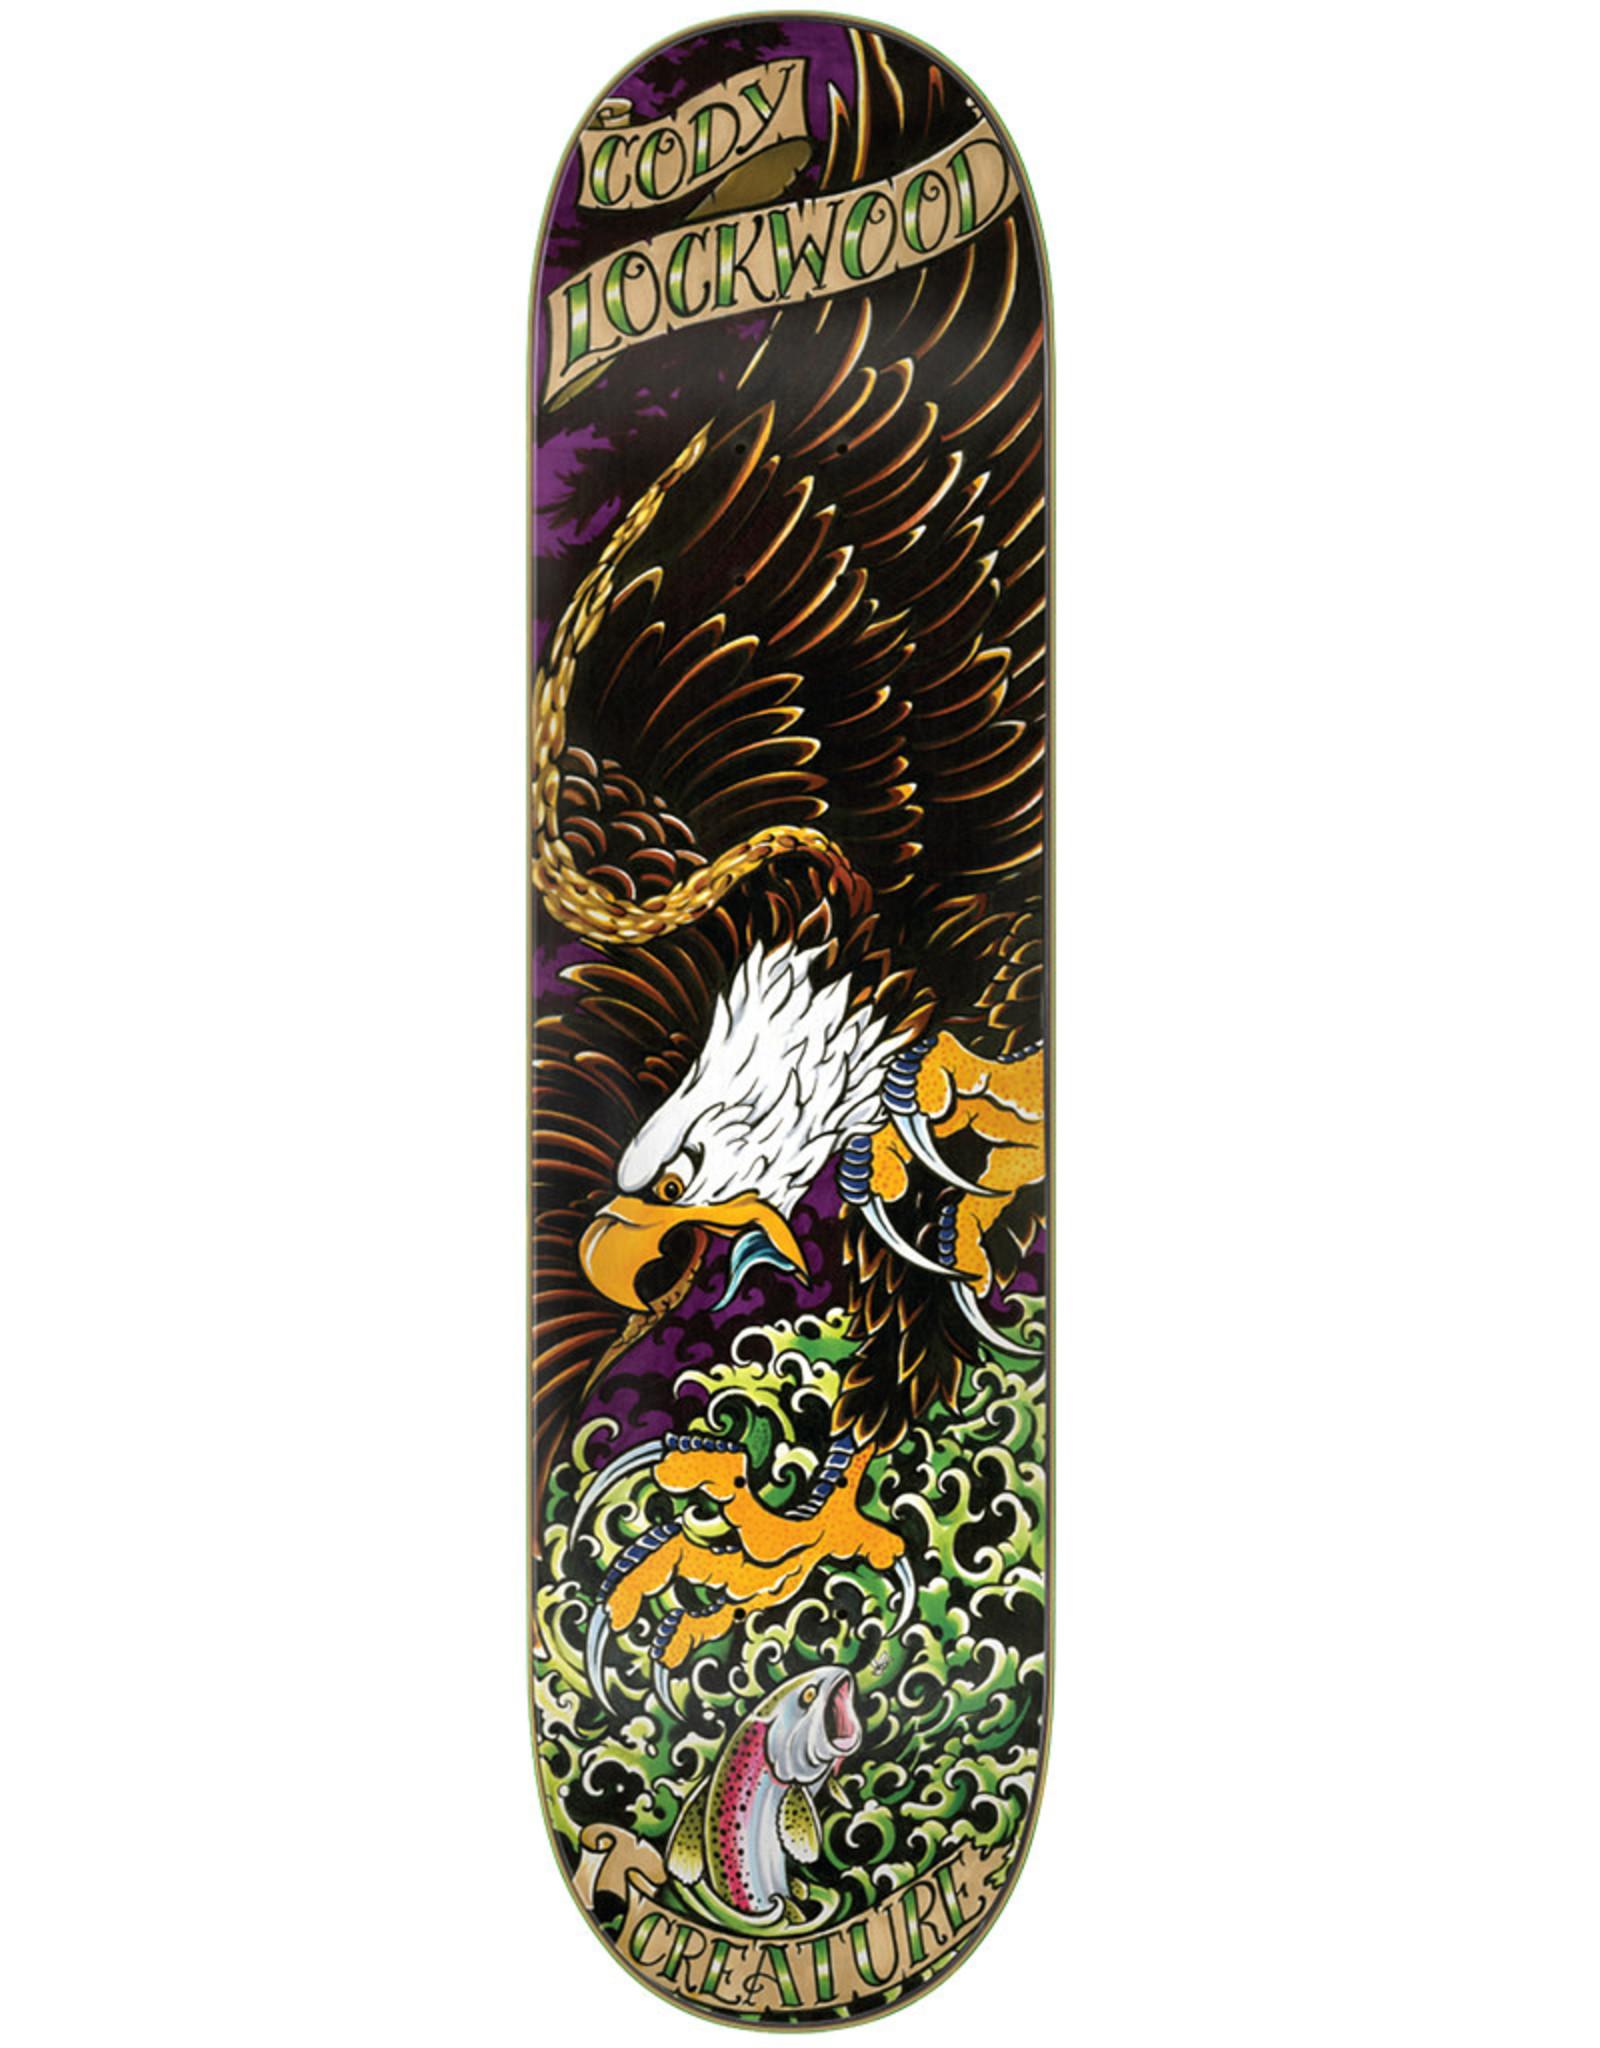 Creature Creature Deck Cody Lockwood Beast Of Prey (8.25)